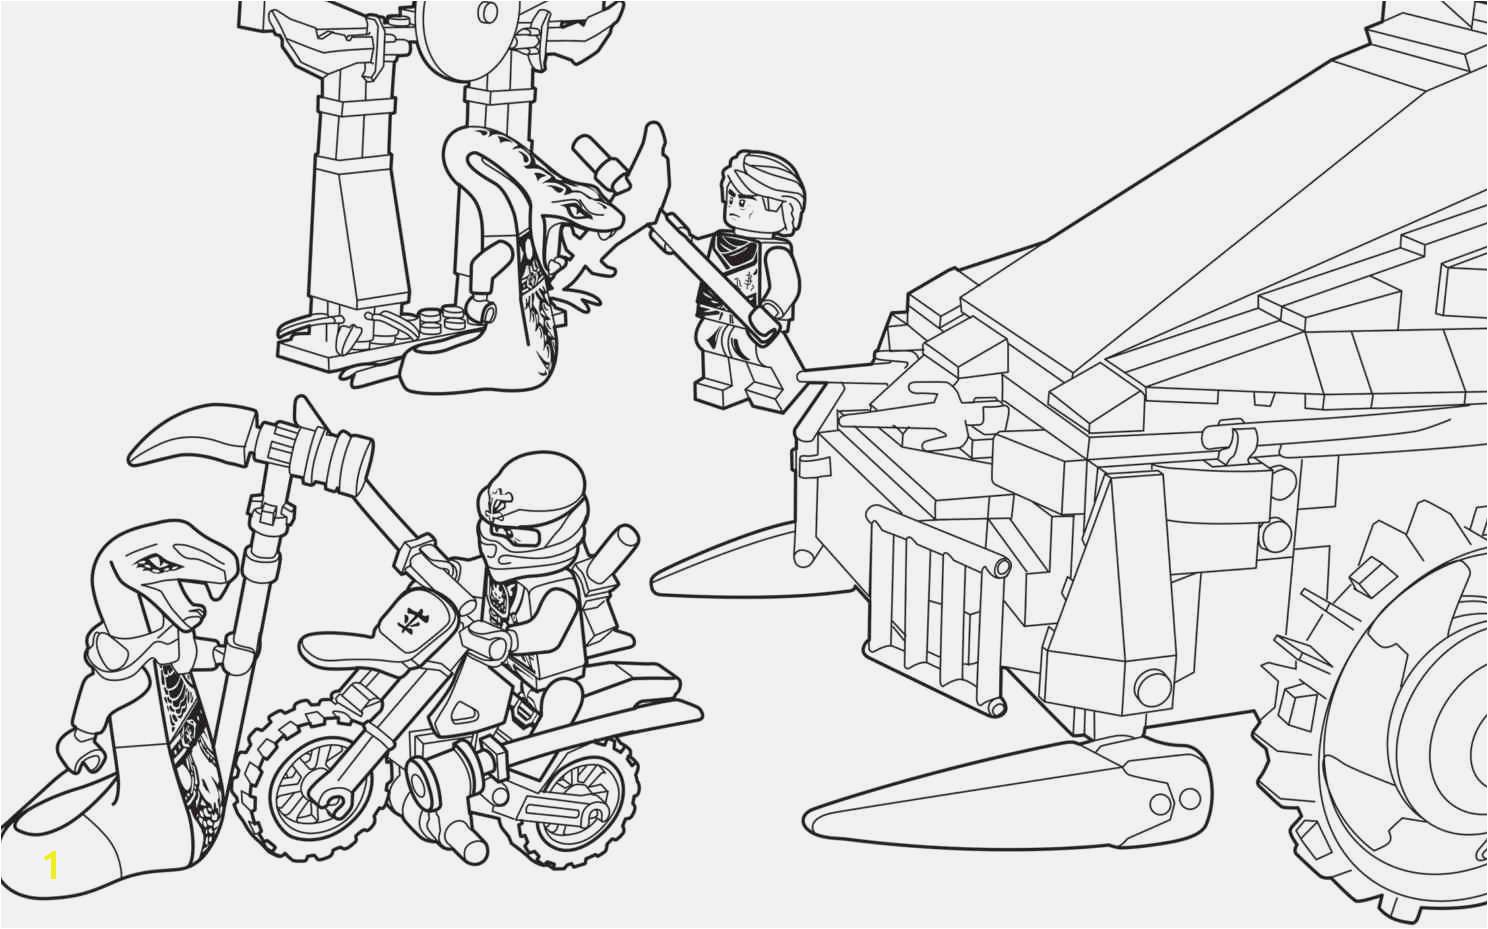 Ausmalbilder Lego Elves Spannende Coloring Bilder Coloring Pages Lego Ninjago Lego Gb